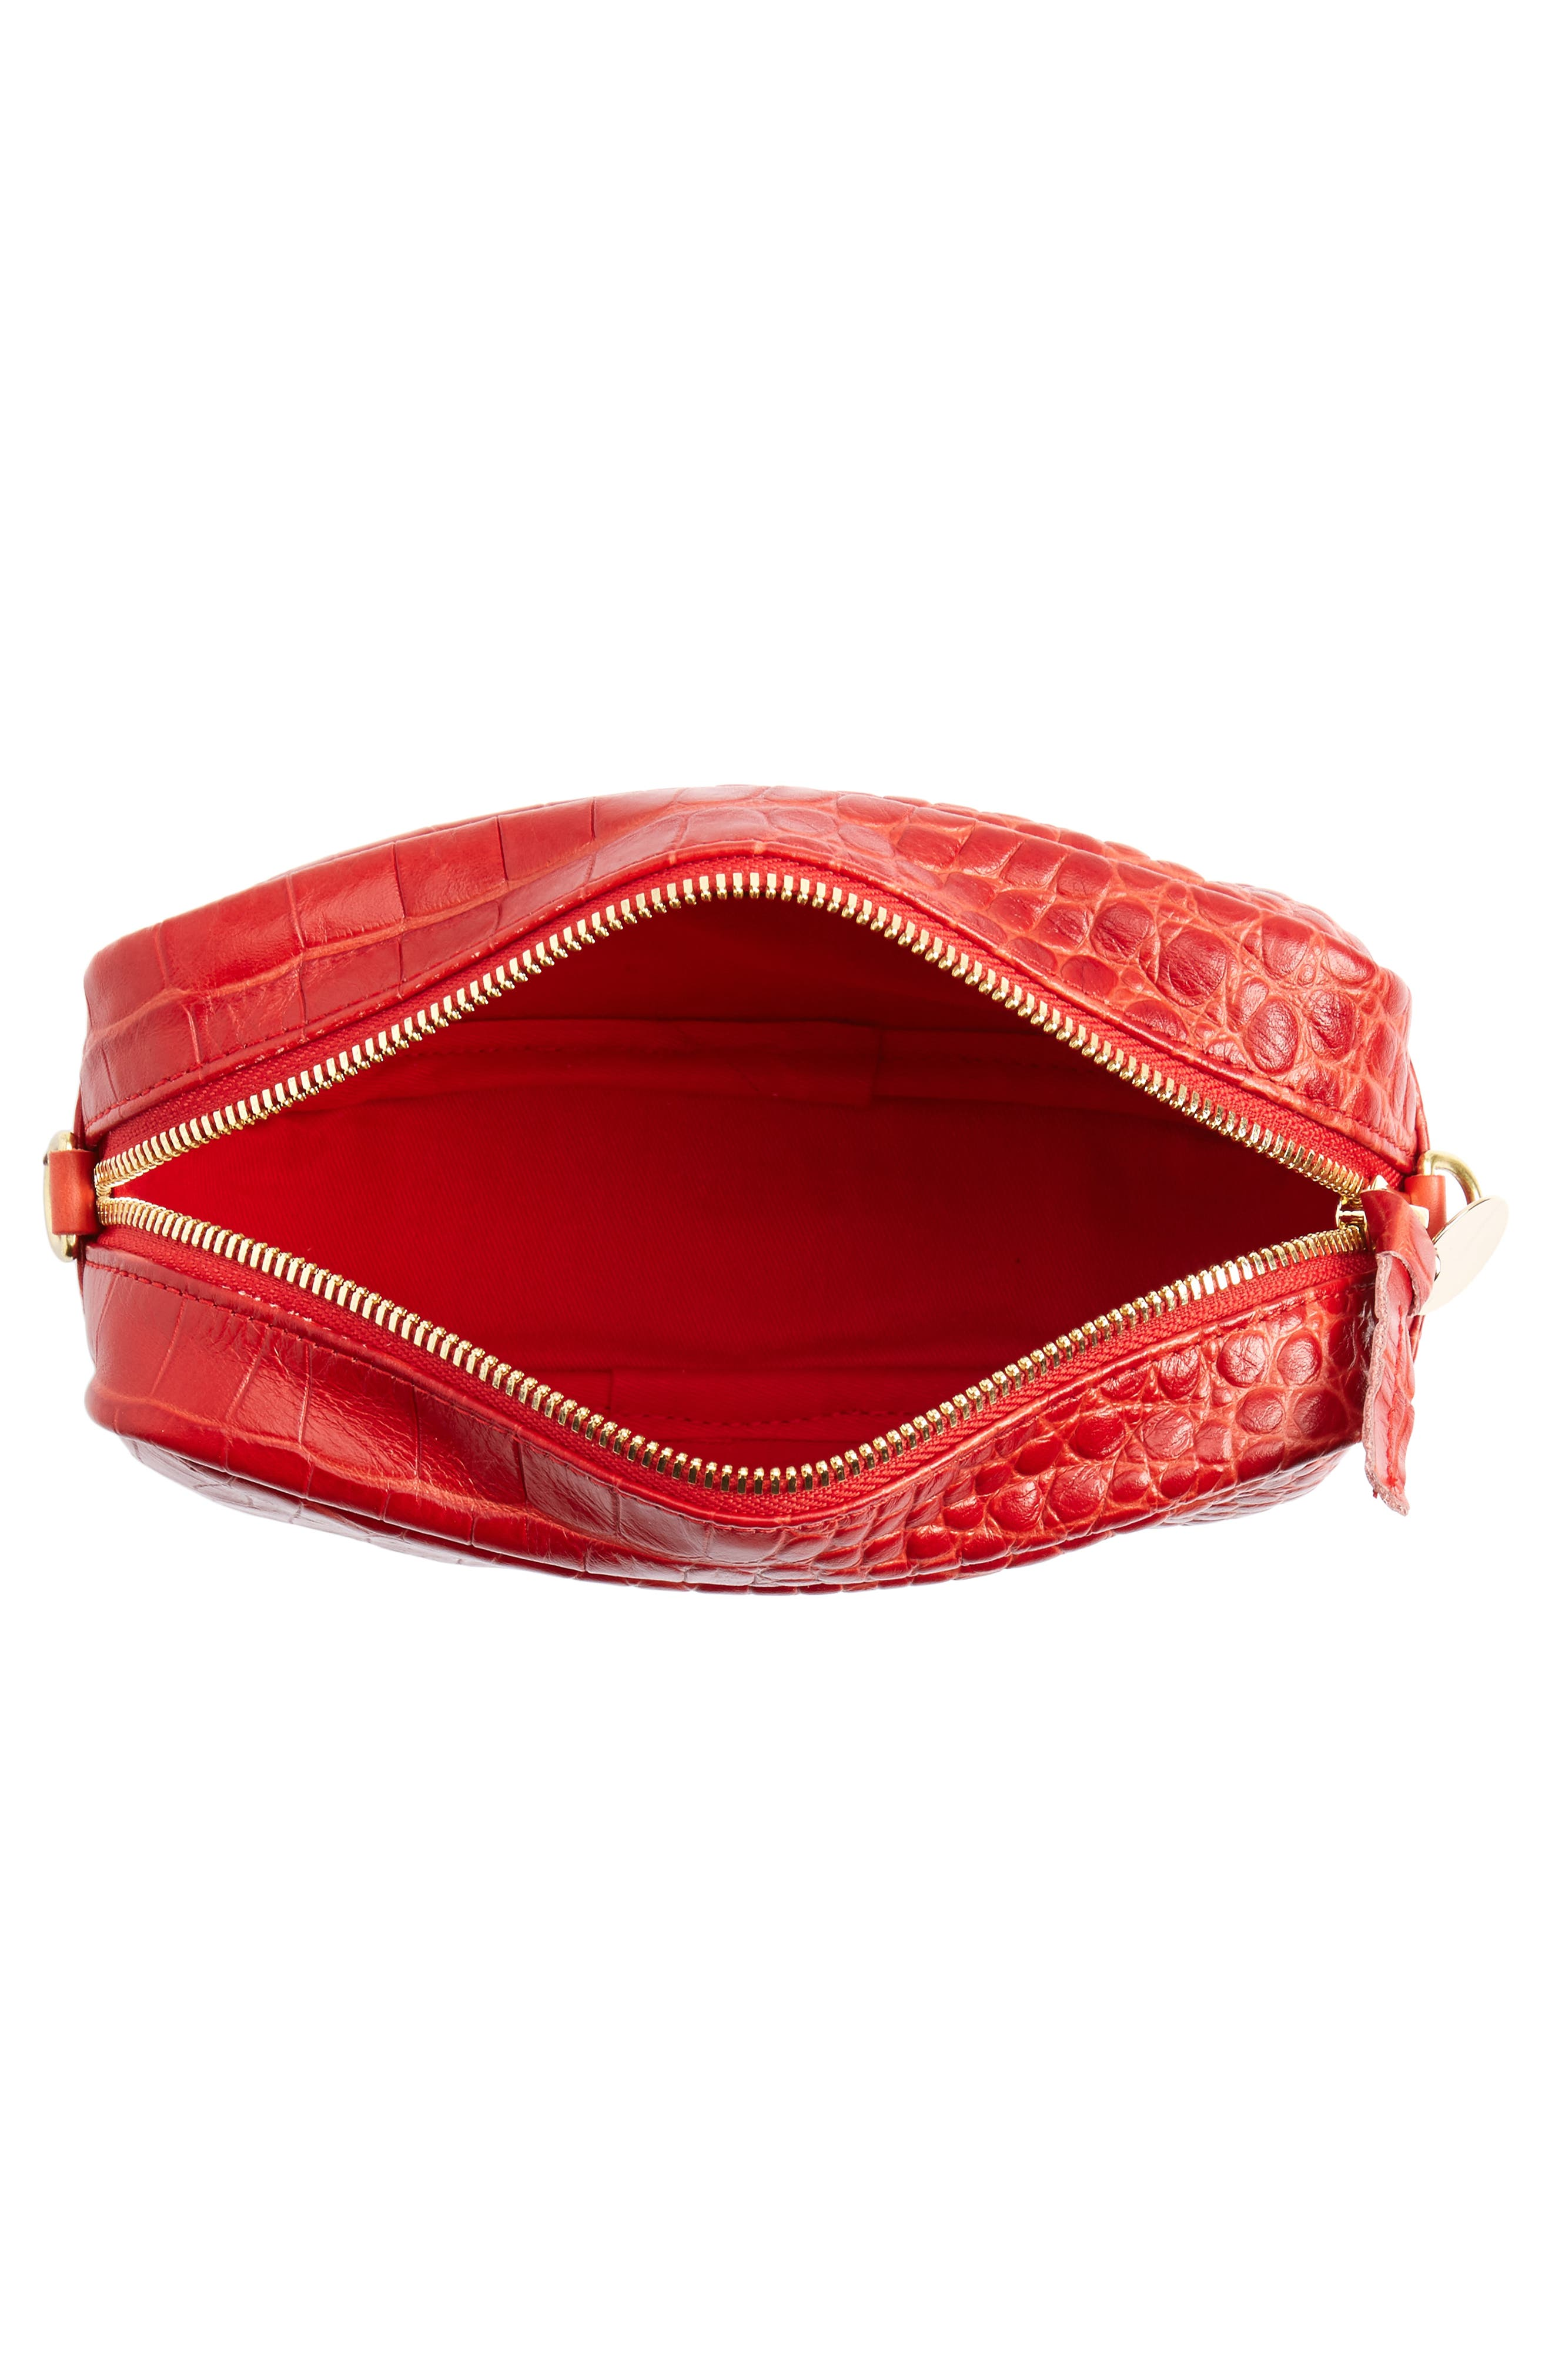 Midi Sac Supreme Croc Embossed Leather Crossbody Bag,                             Alternate thumbnail 4, color,                             Red Croco